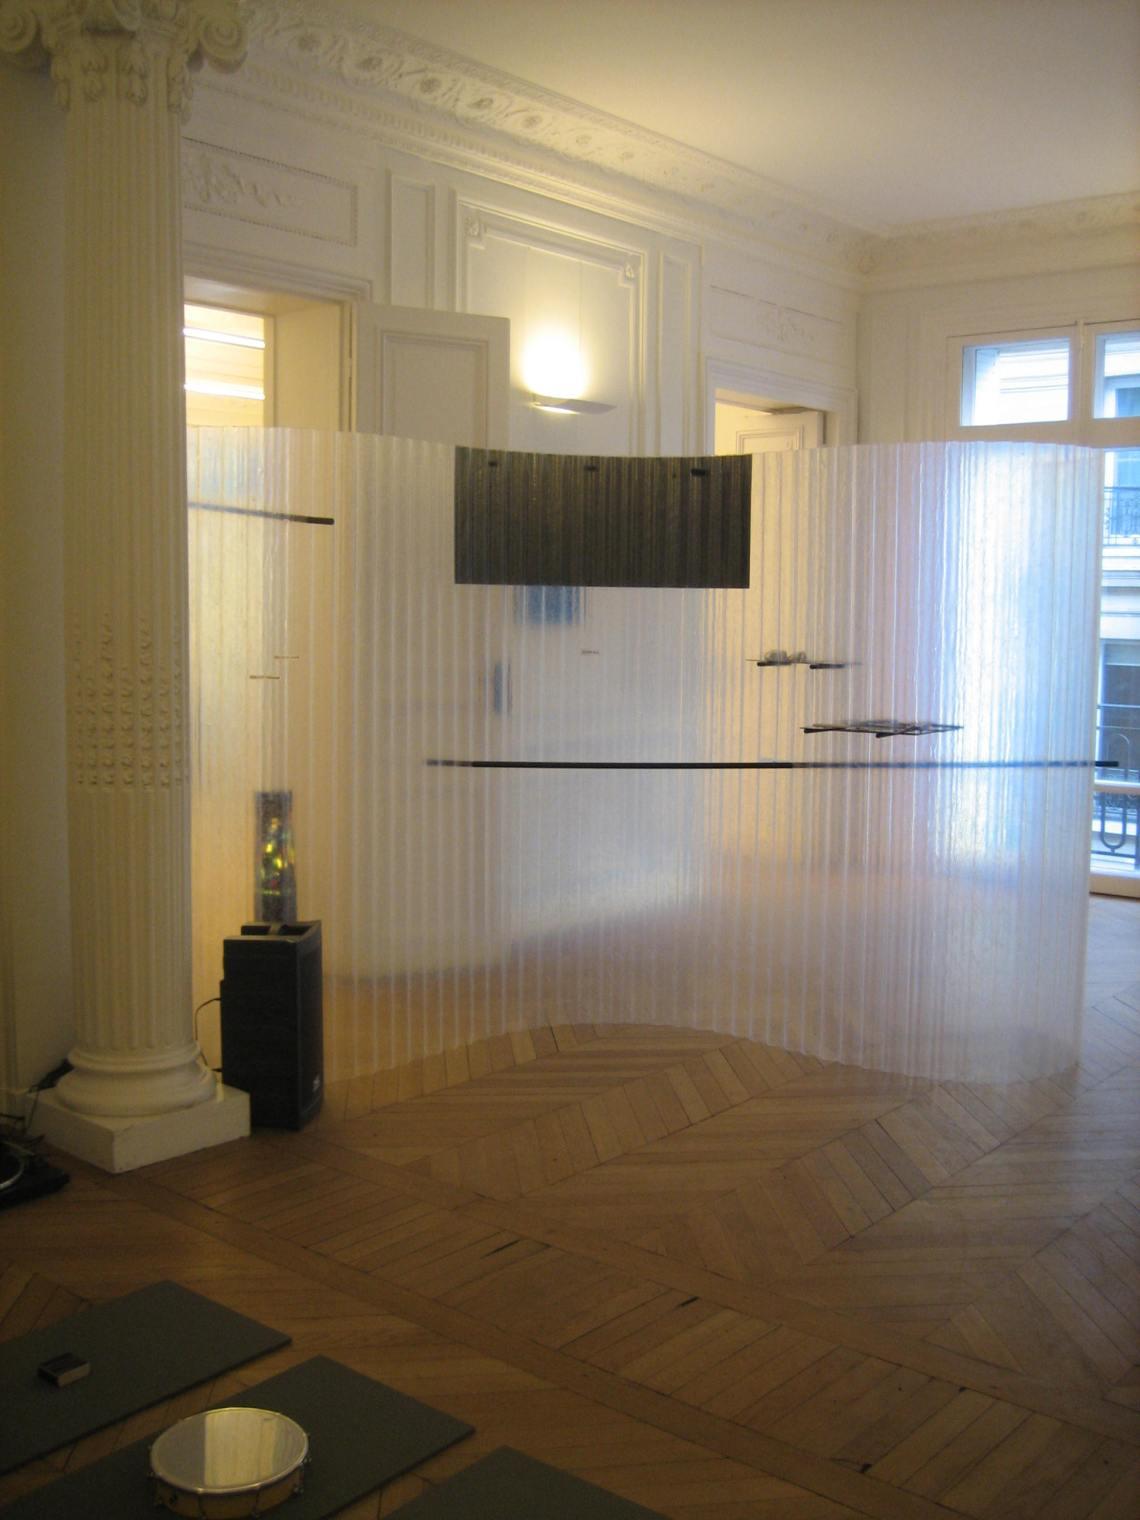 Stralen & Reflecteren, Atelier Néerlandais, Parijs, oktober 2017. Foto Esther Doornbusch, CC BY 4.0